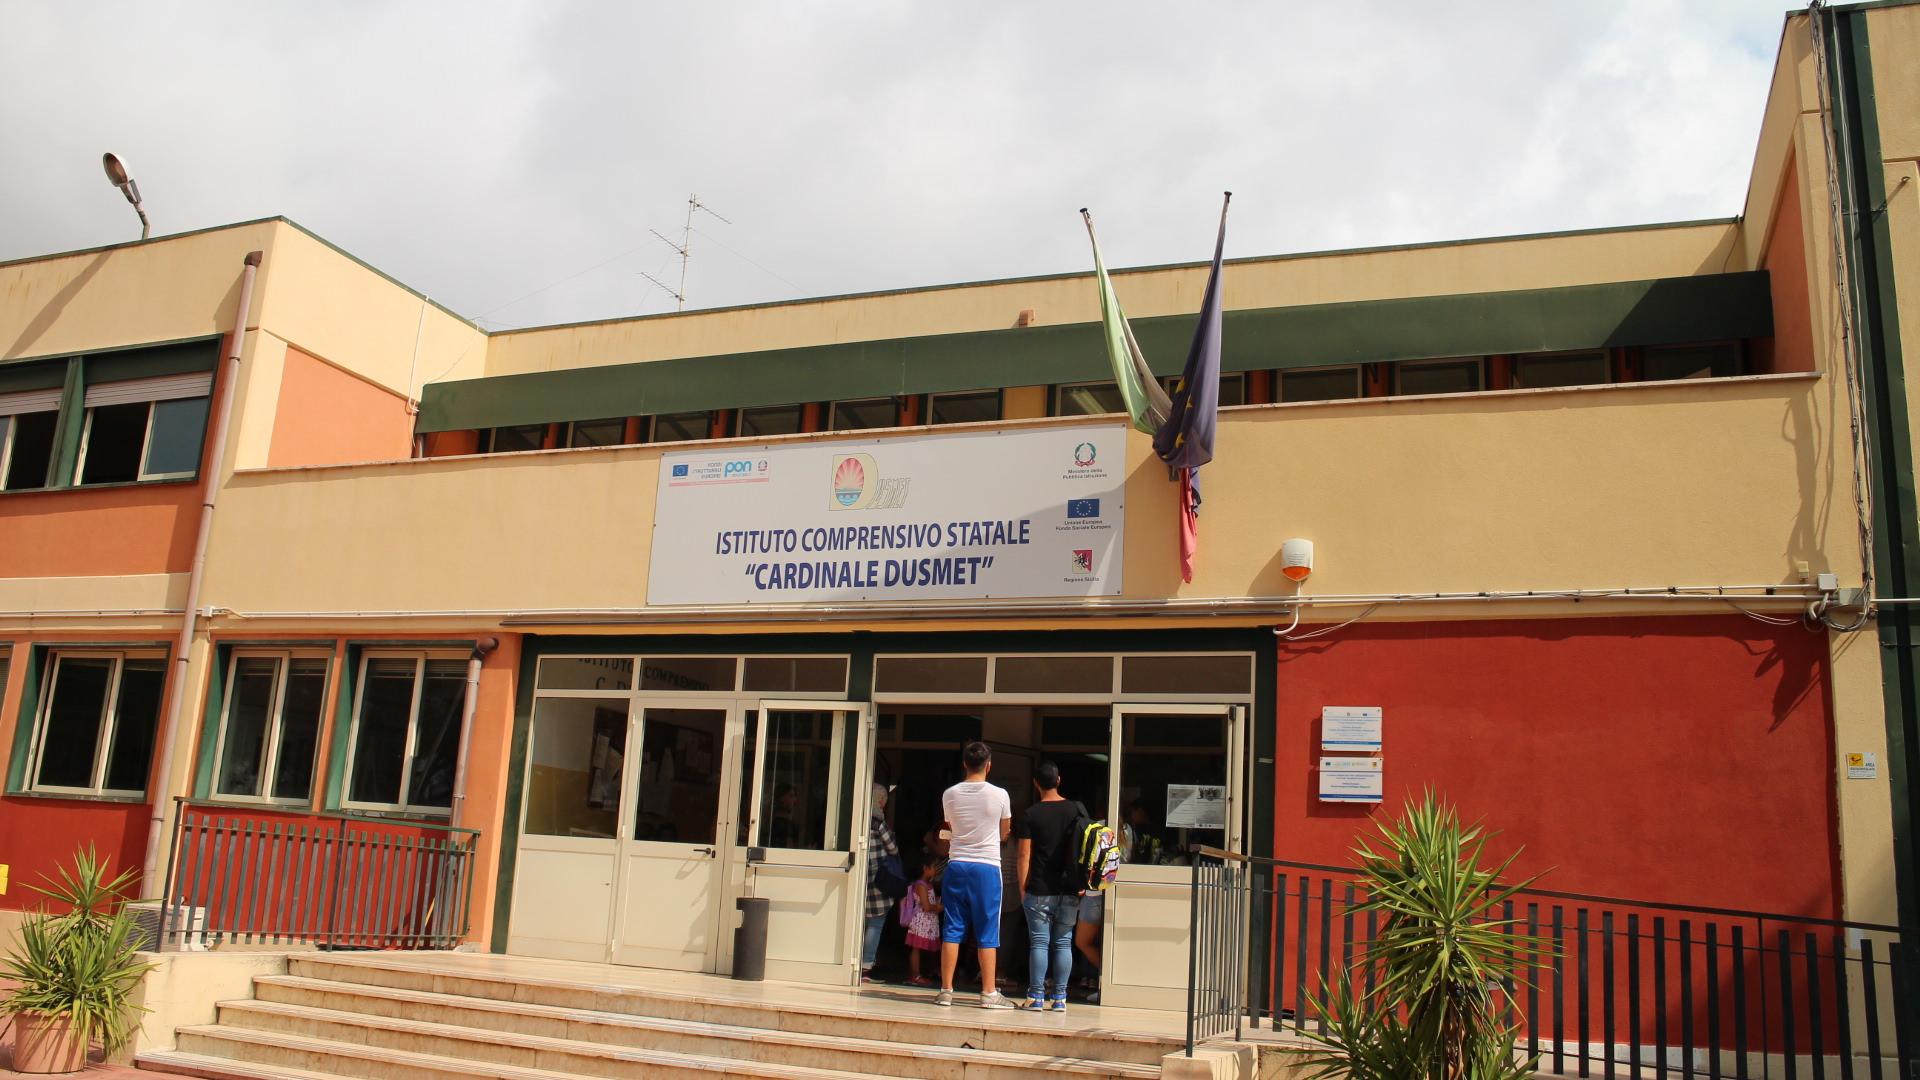 Scuola 2.0 e 3.0: la Dusmet – Doria all'avanguardia